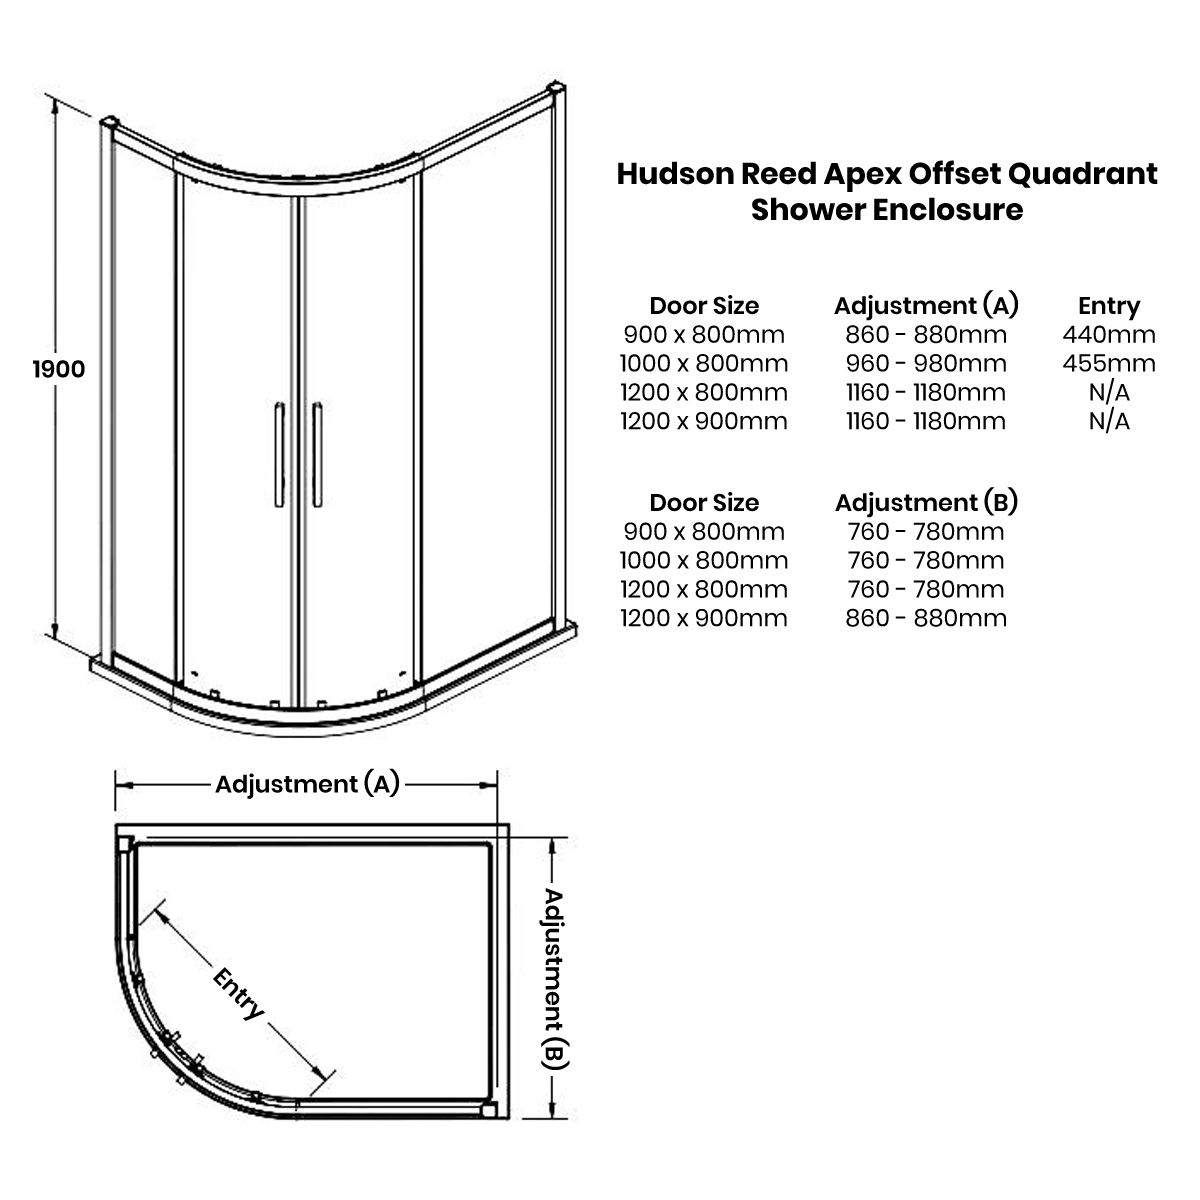 Hudson Reed Apex Offset Quadrant Shower Enclosure Dimensions